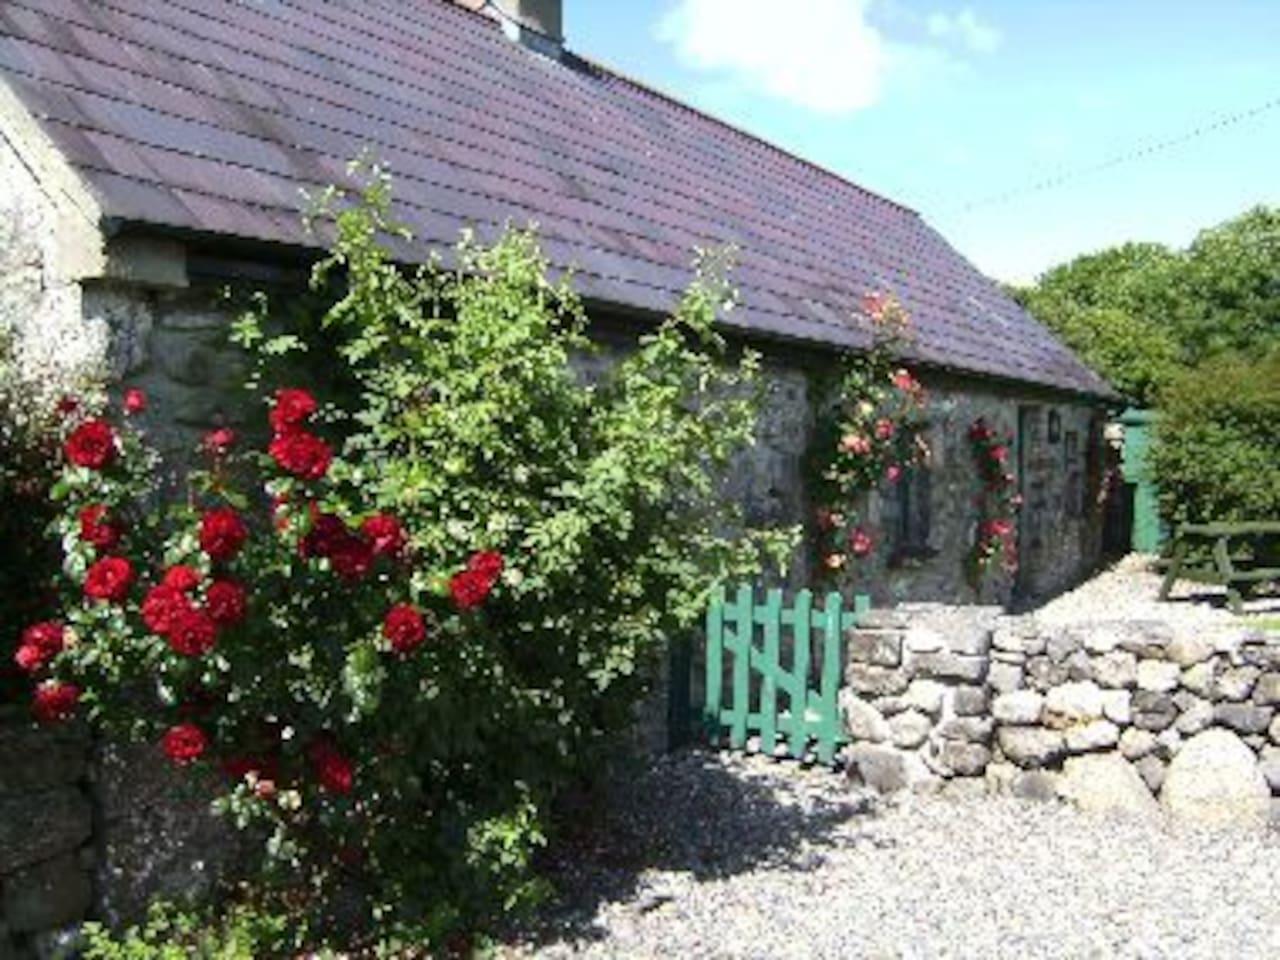 BriarRose Cottage